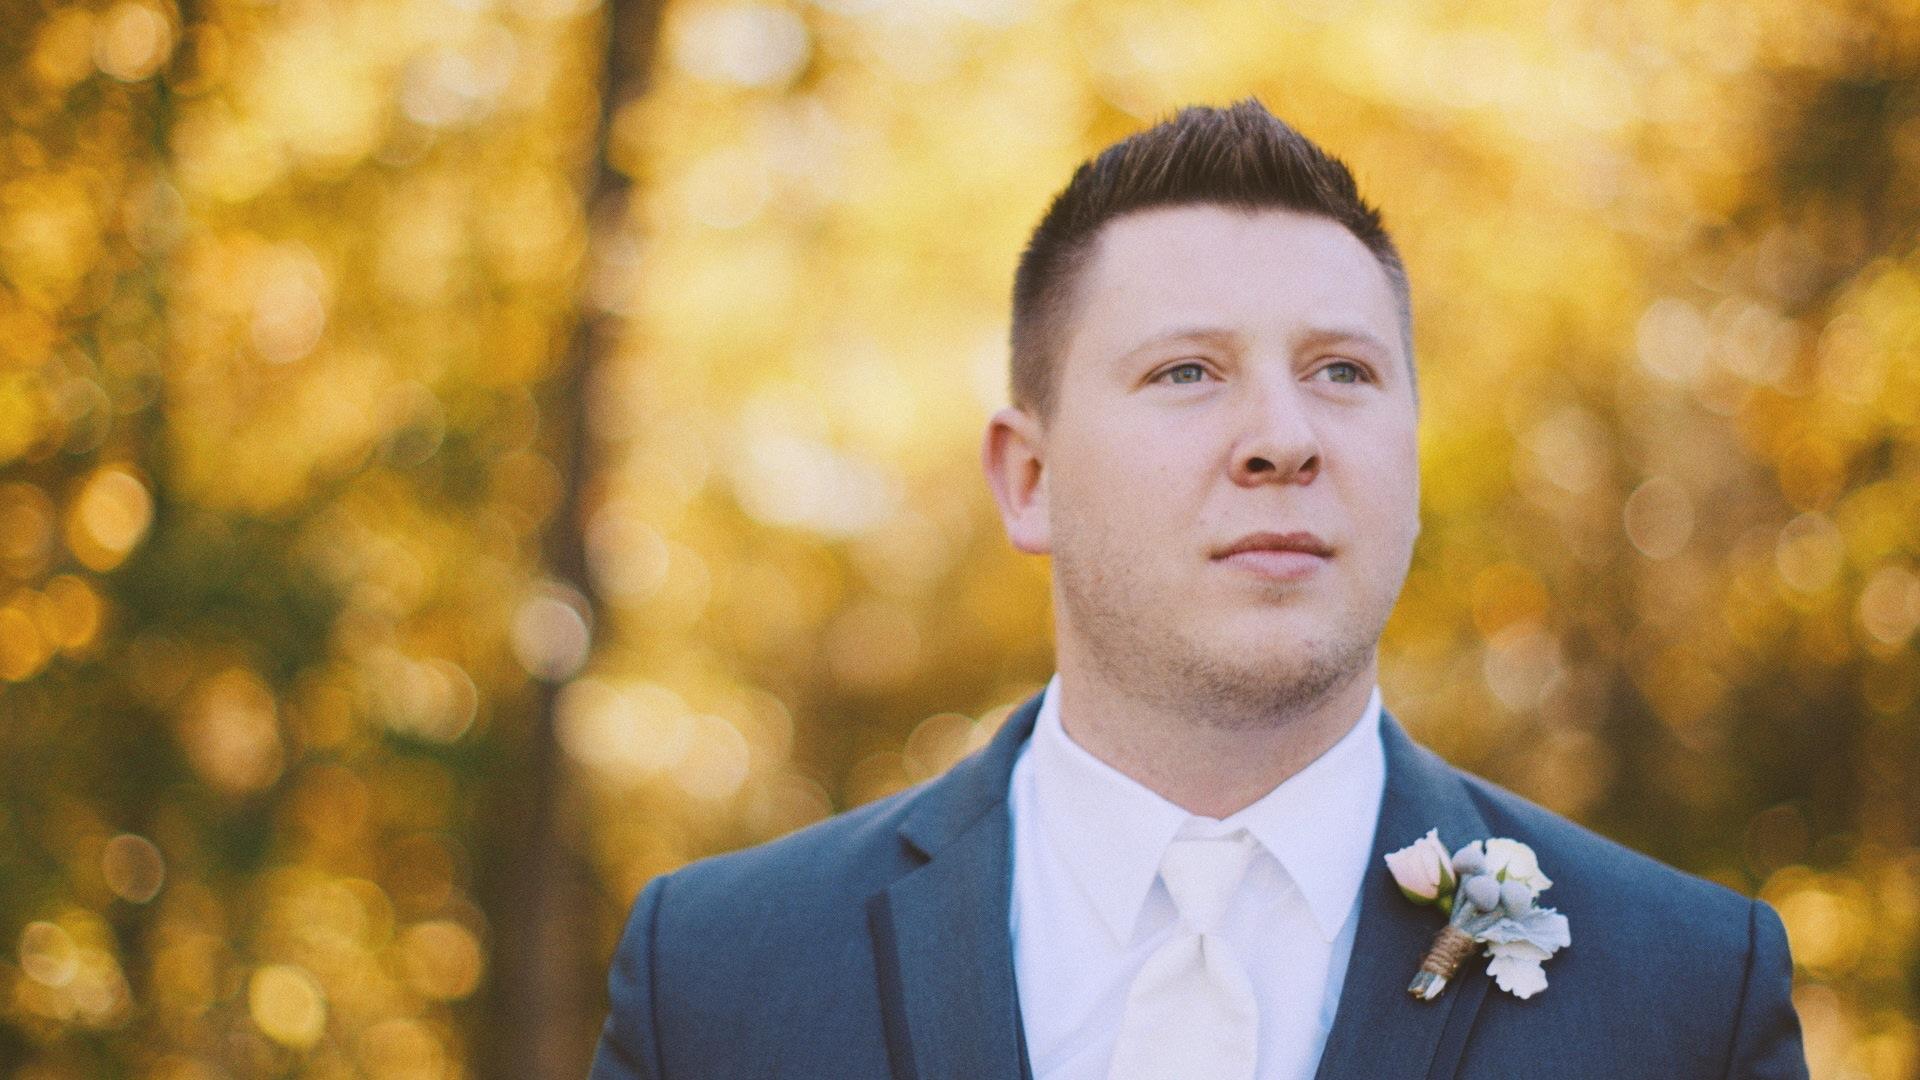 Wedding Videographer Tahoe, CA